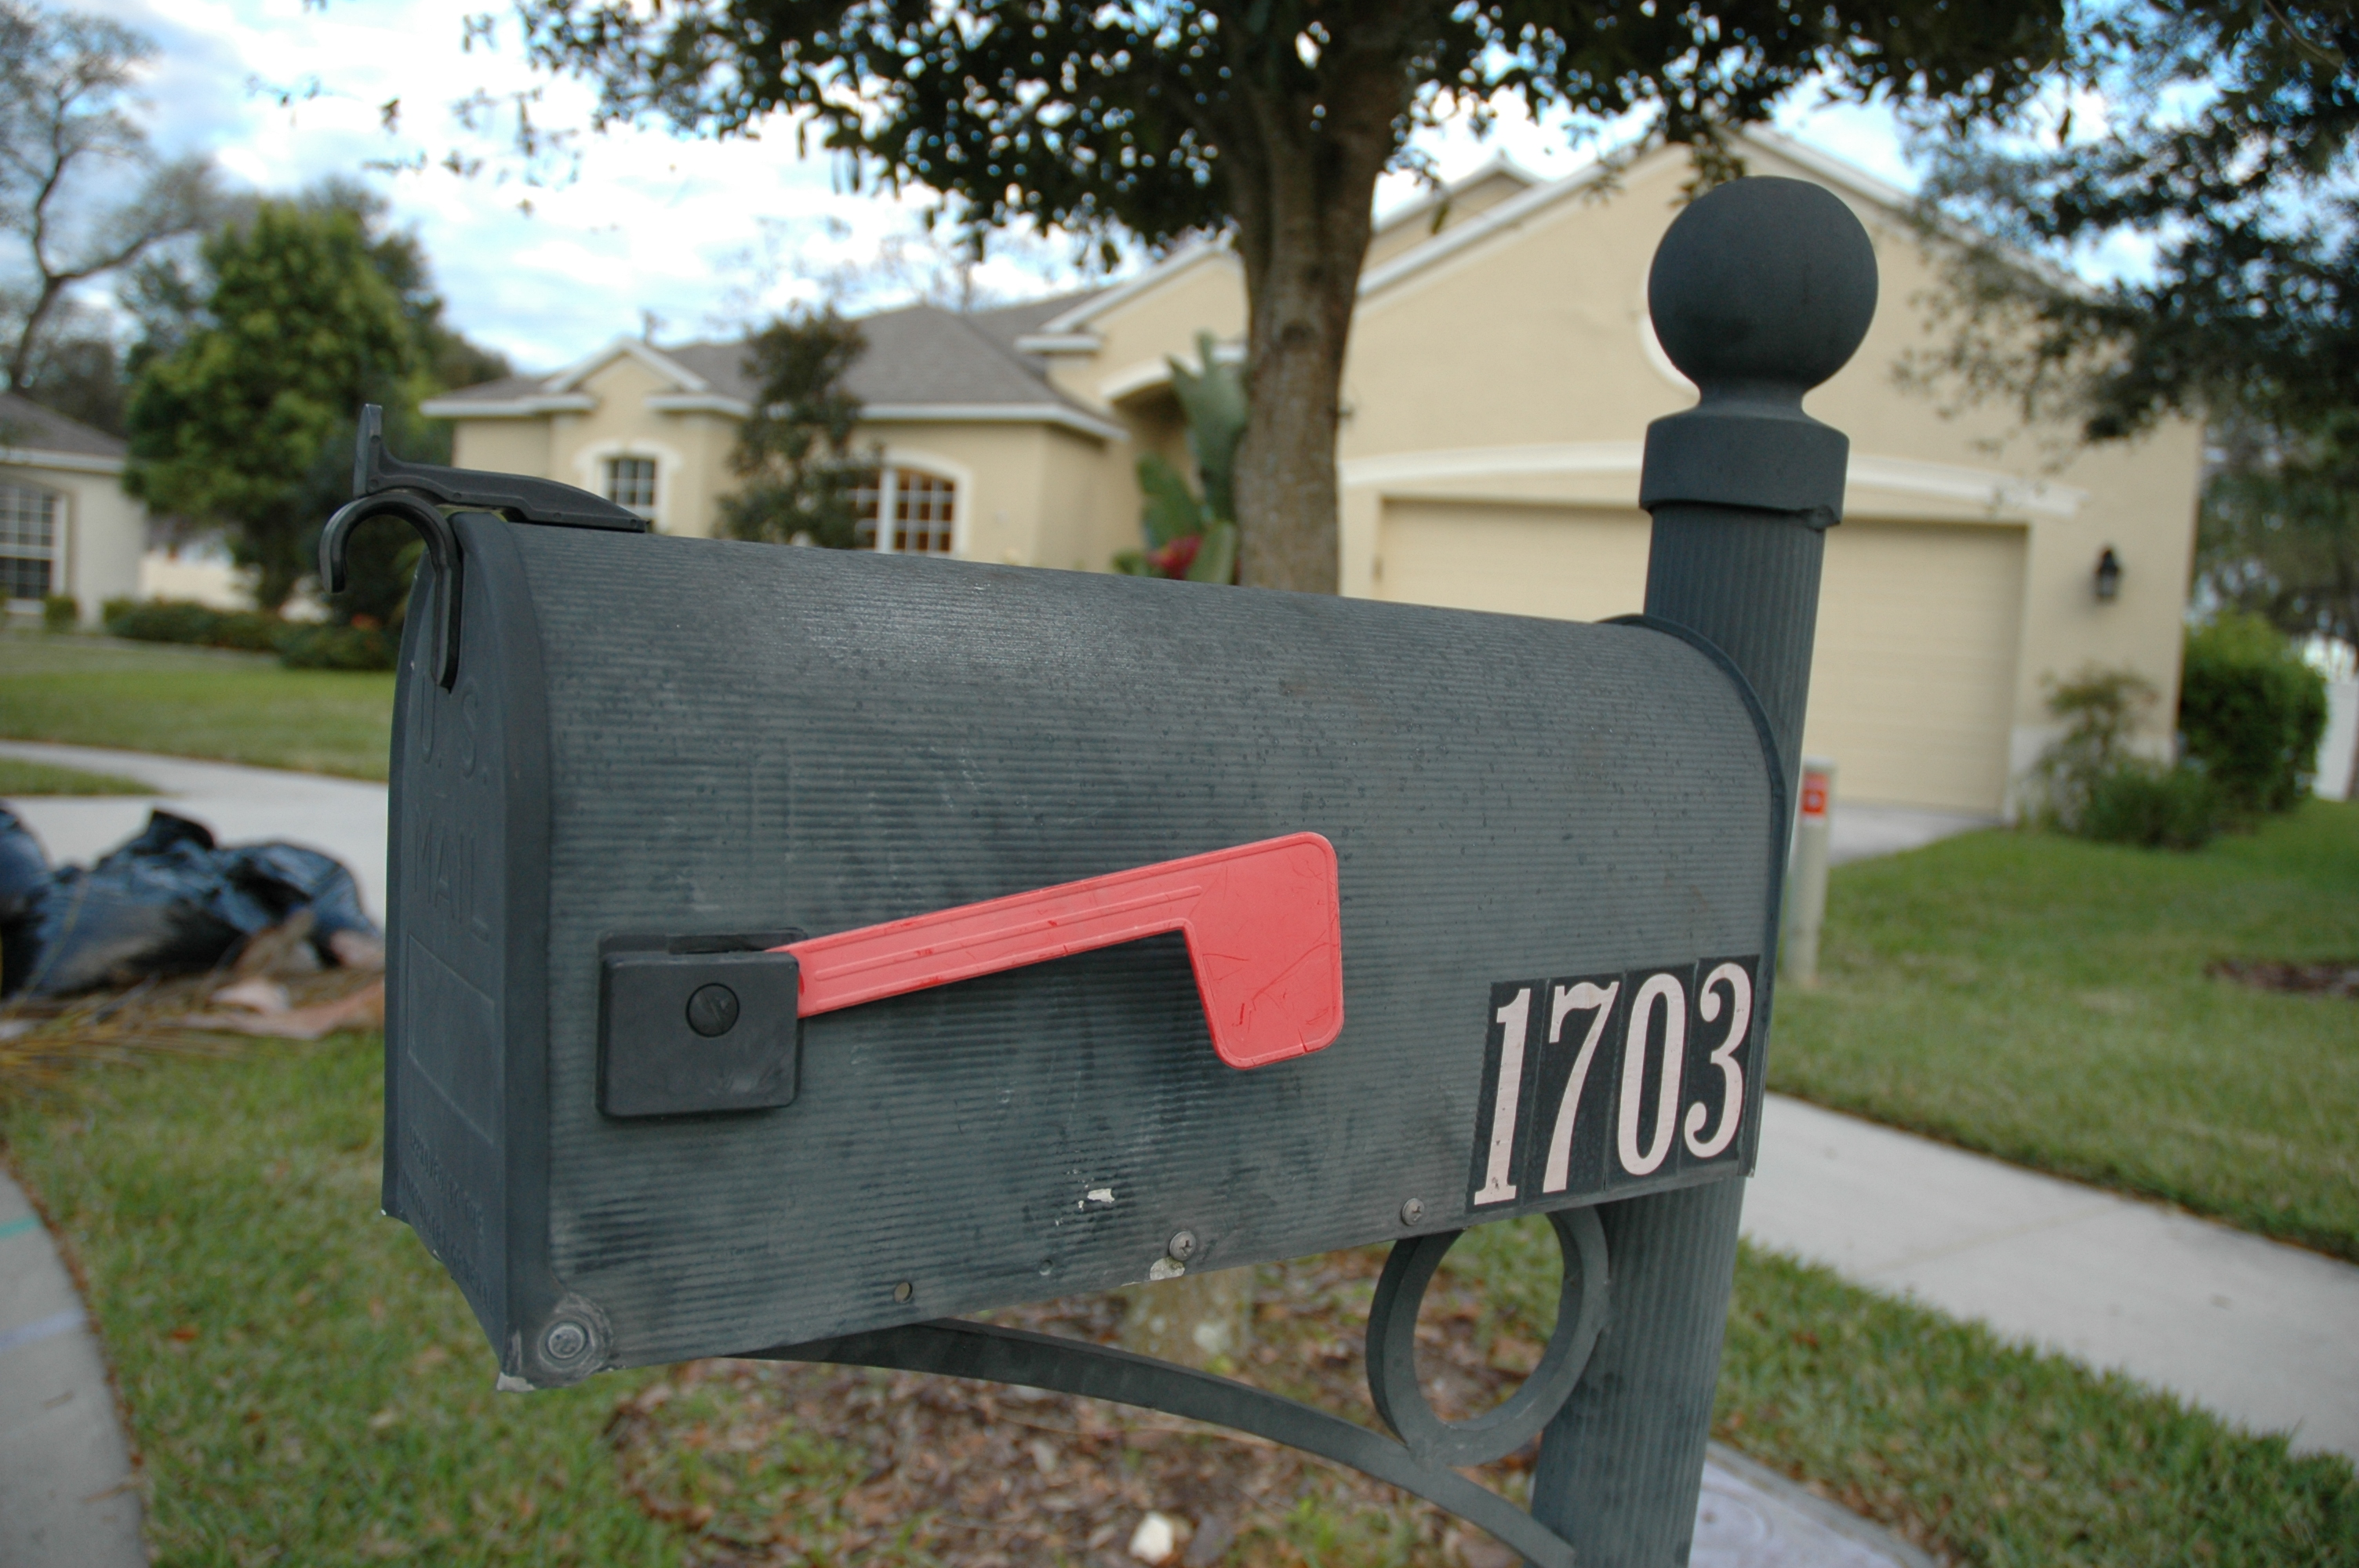 File:Mailbox USA.jpg - Wikimedia Commons